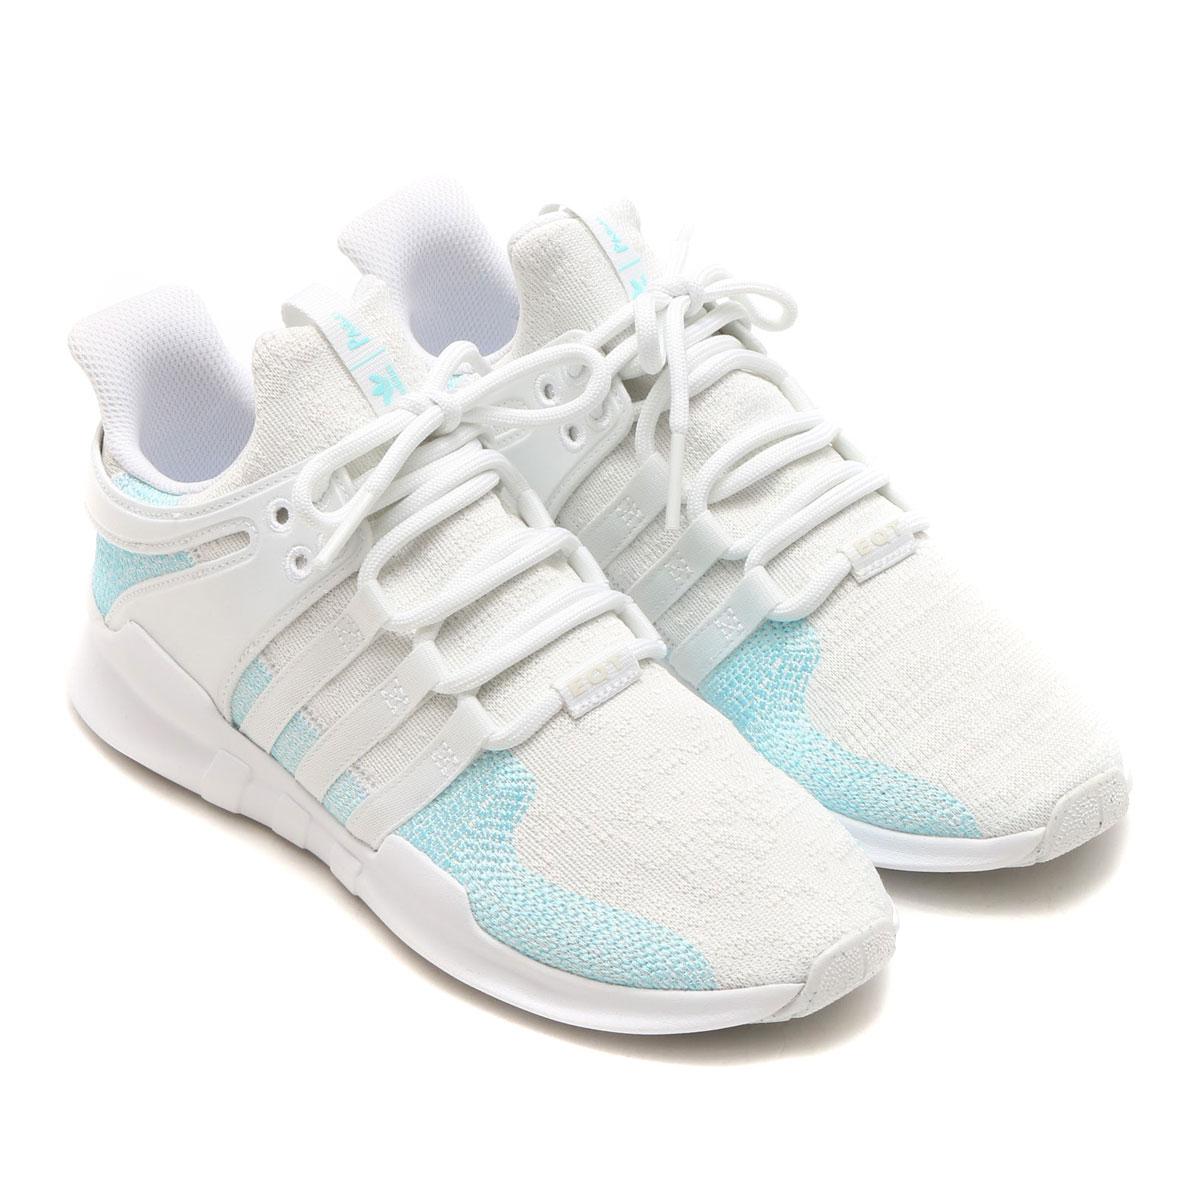 adidas Originals EQT SUPPORT ADV CK PARLEY (アディダス オリジナルス EQT サポート CK パーレイ)Running White/Blue Sprit/Off White【メンズ レディース スニーカー】17FW-I